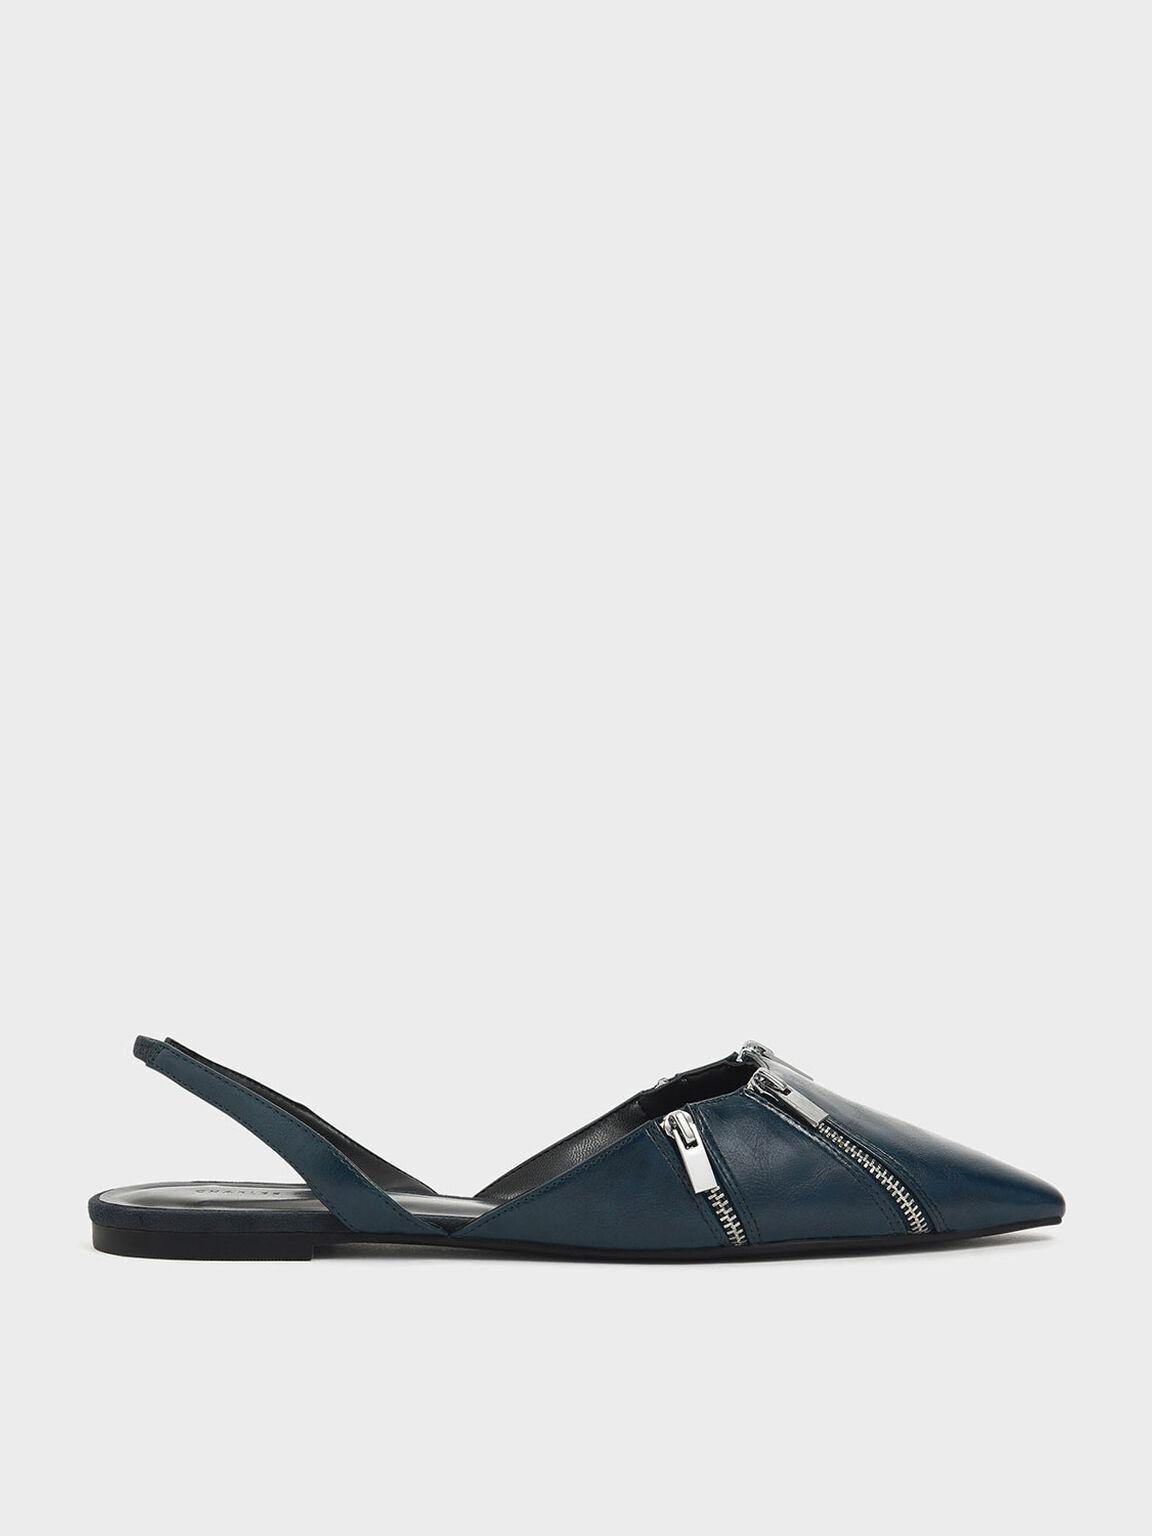 Zip Detail Pointed Toe Slingback Flats, Dark Green, hi-res